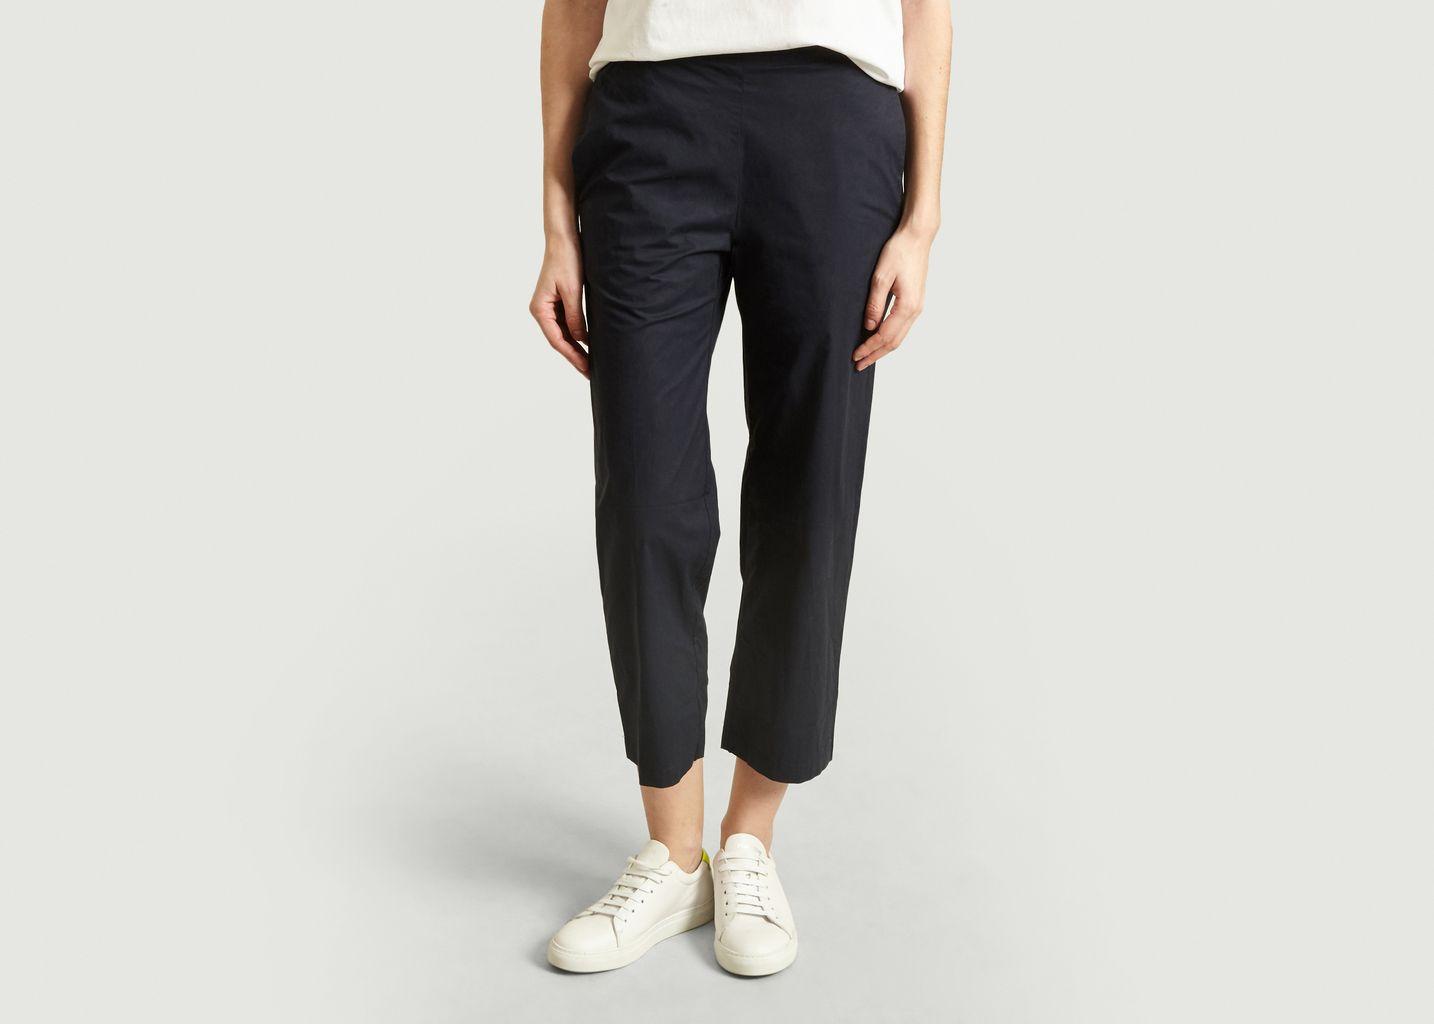 Pantalon 7/8e Loribi - Loreak Mendian